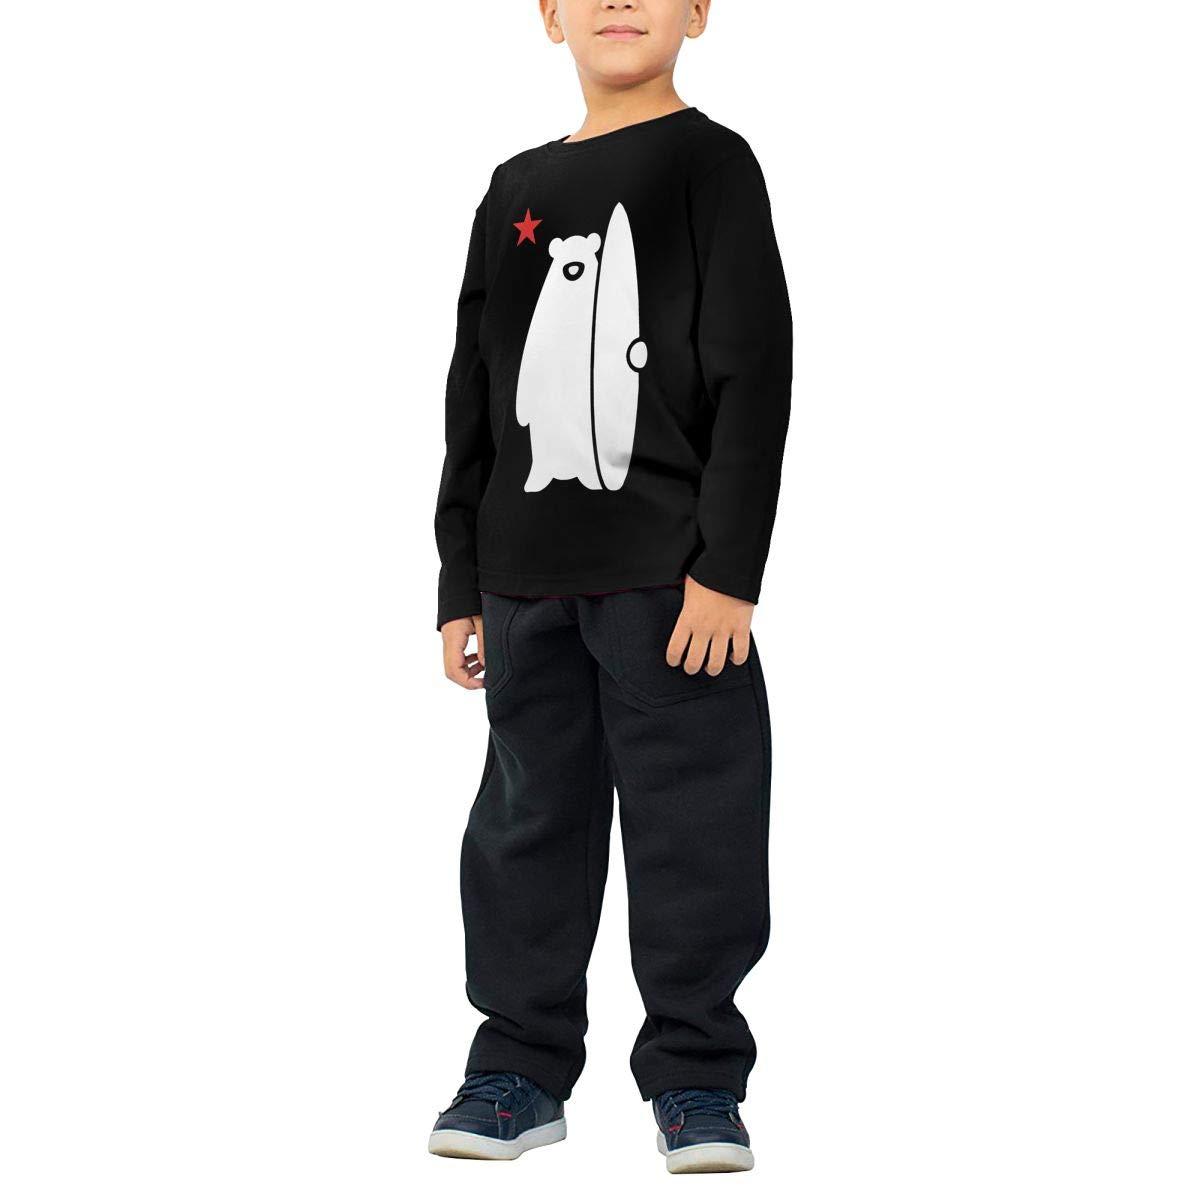 SKYAKLJA California Surf Bear Childrens Black Cotton Long Sleeve Round Neck T-Shirt for Boy Or Girl